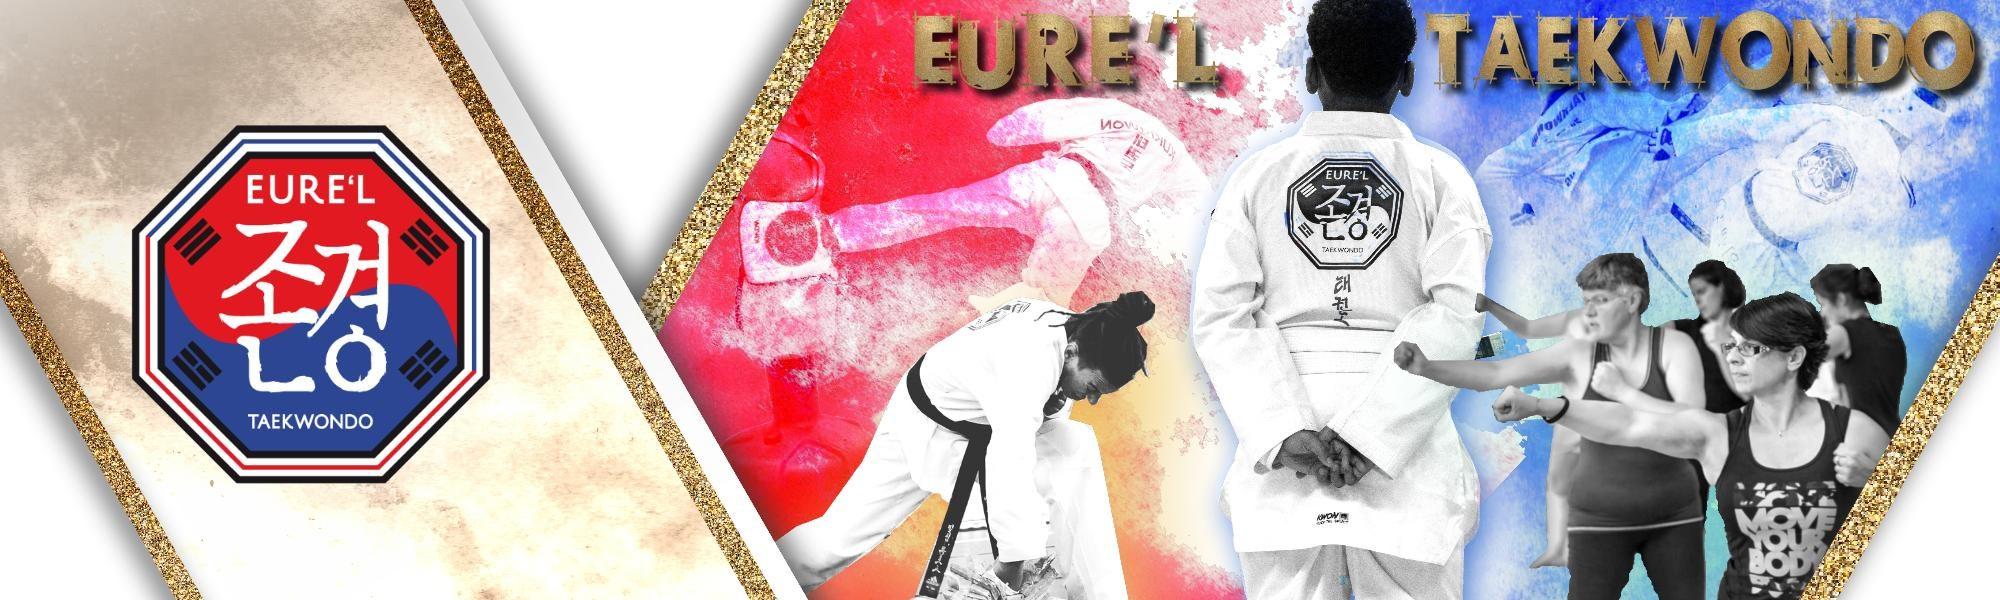 eurel-taekwondo.fr